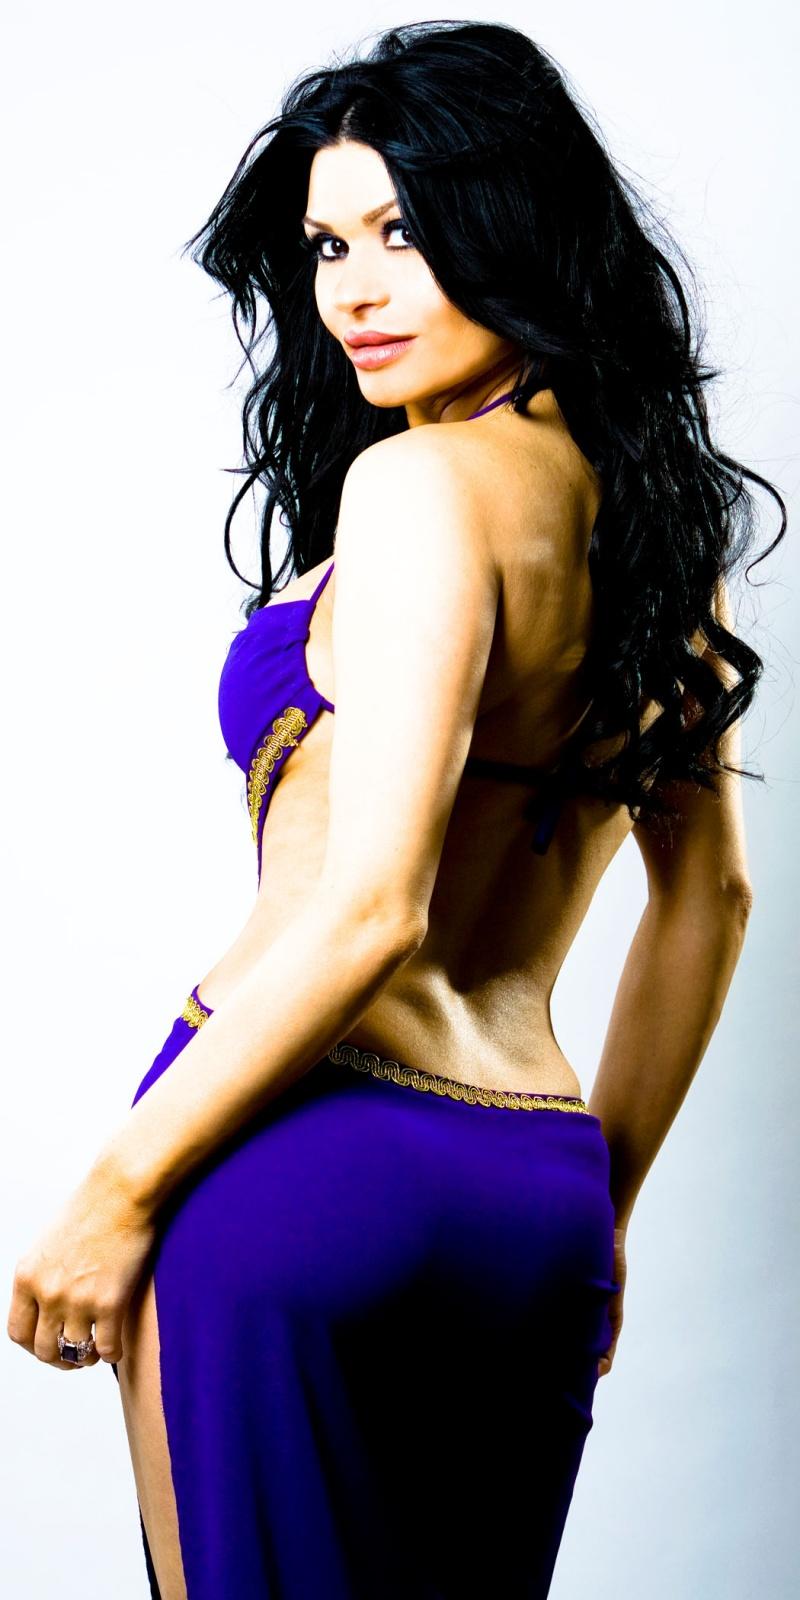 Oshawa-STUDIO Apr 26, 2009 Zdenka Darula IONA-purple dress